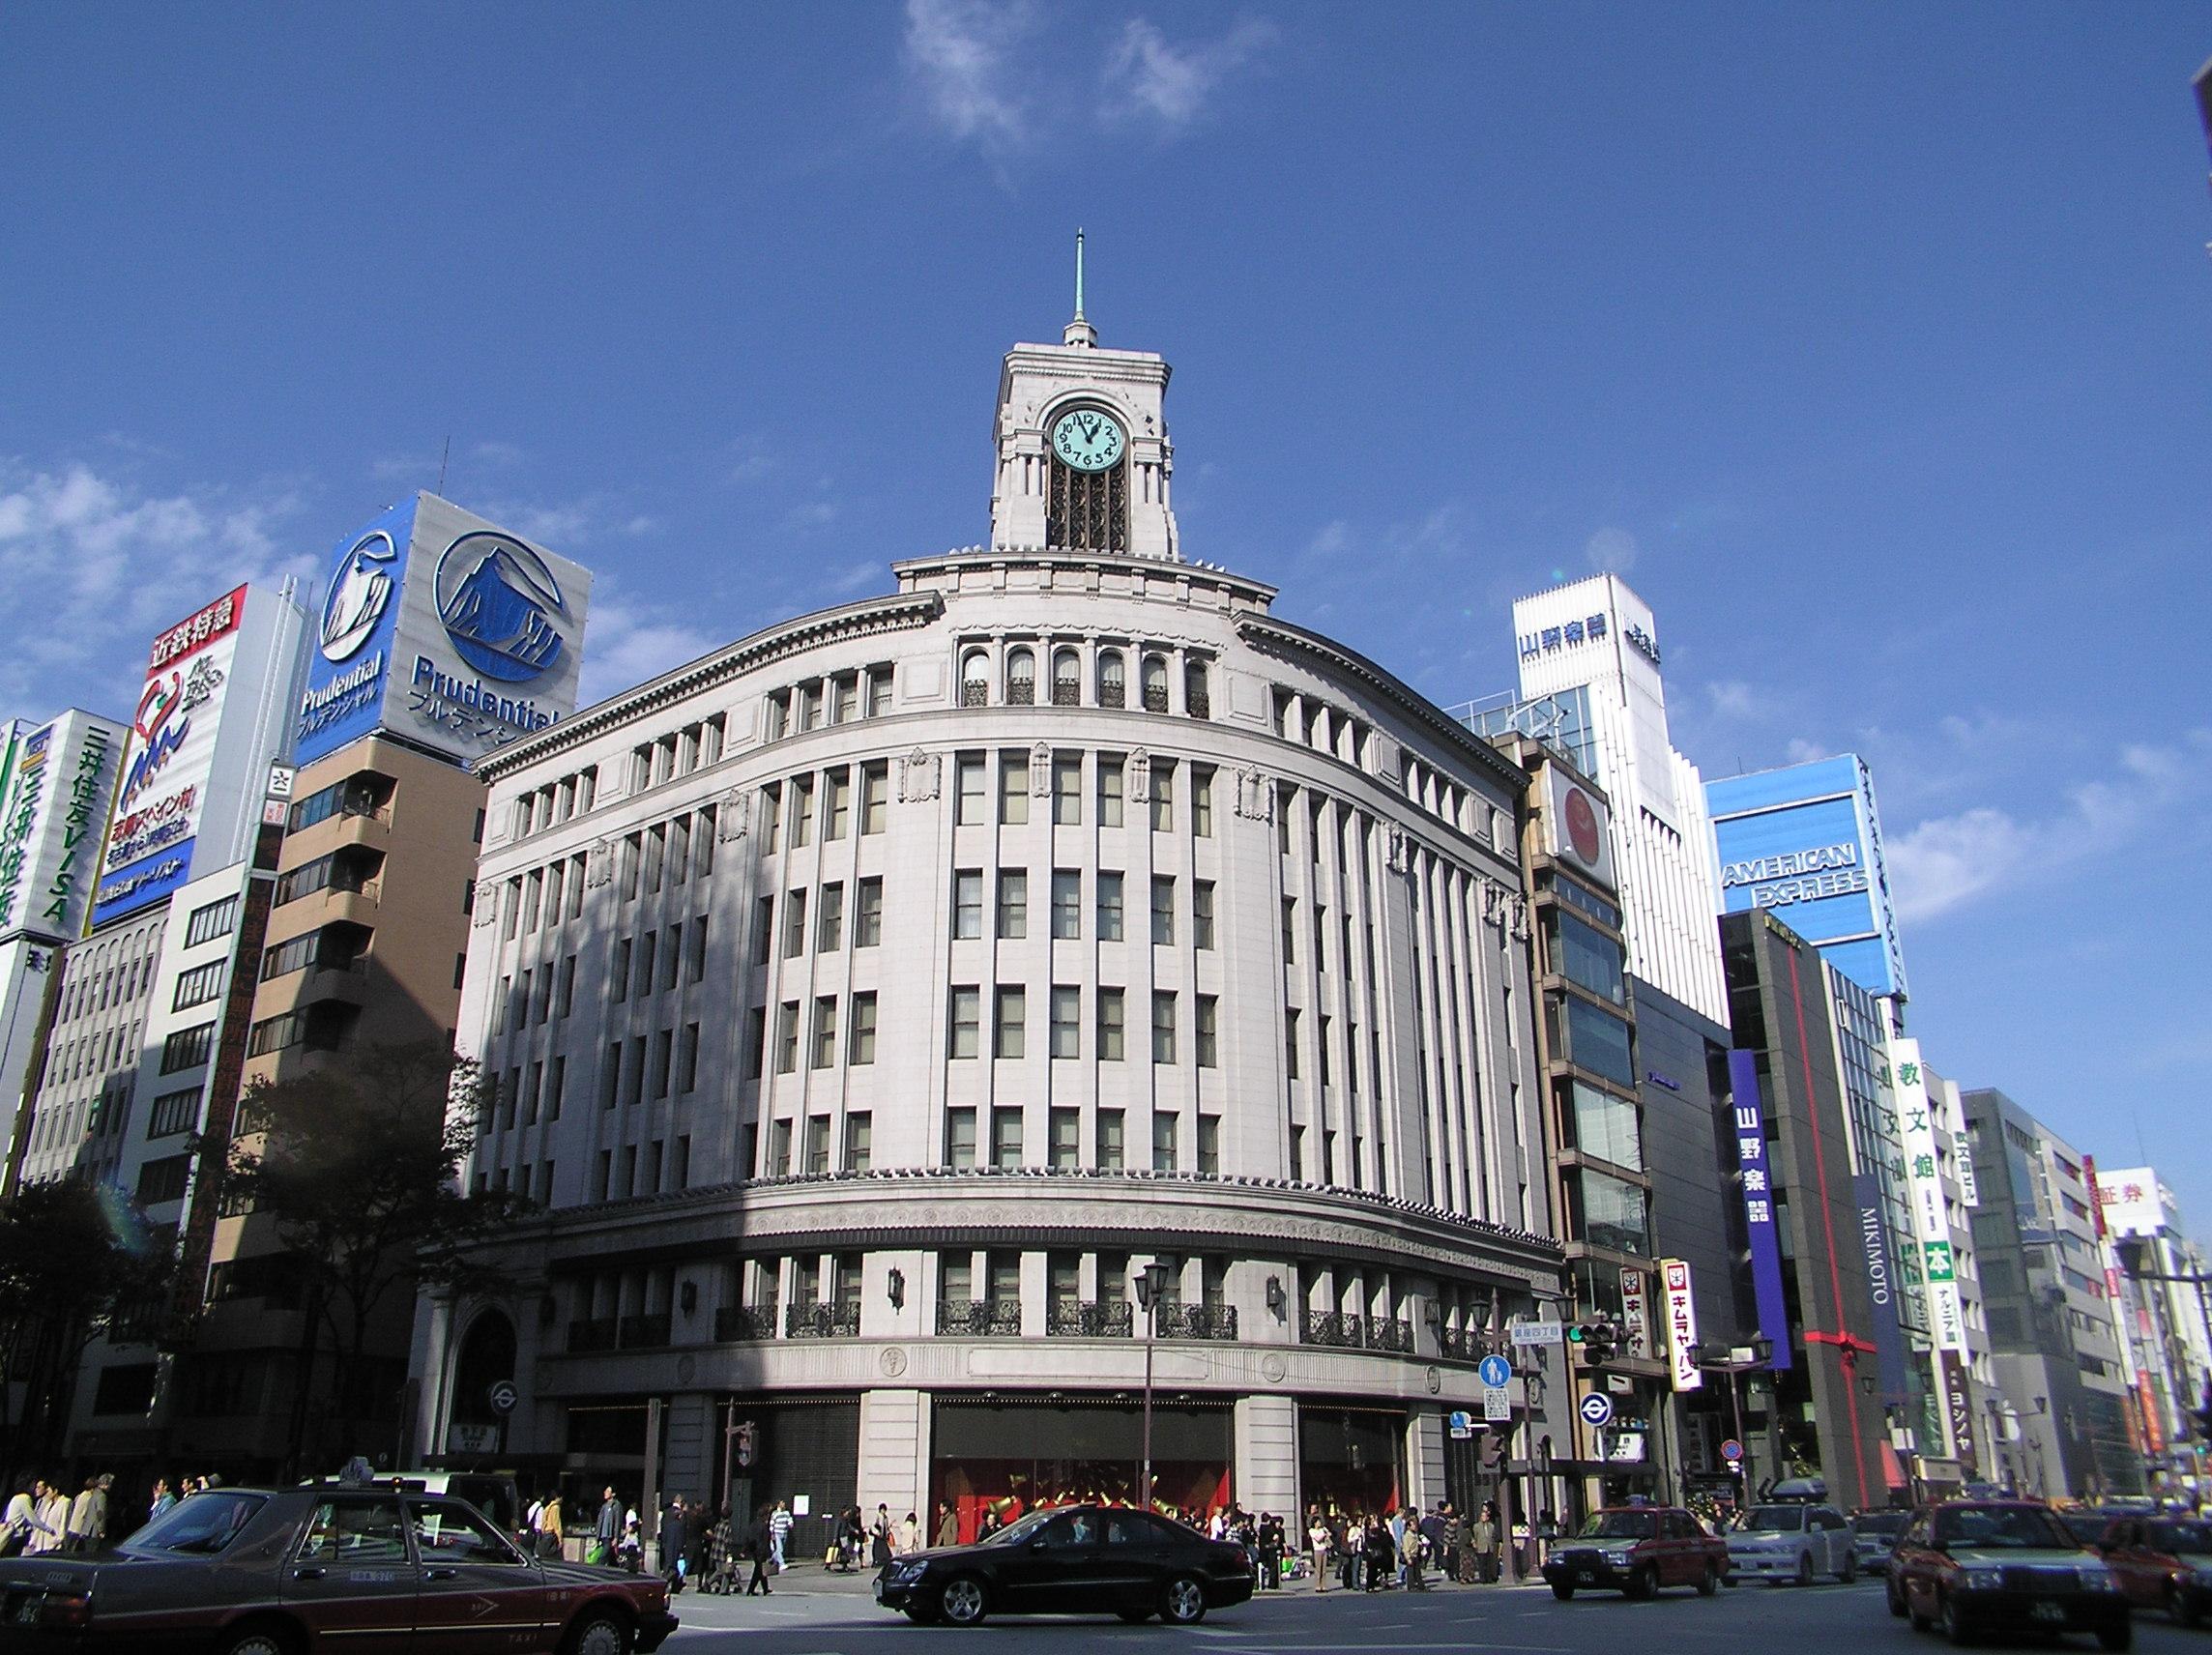 File:Wako Ginza Chuo Tokyo 4 16 November 2003.jpg - Wikimedia Commons